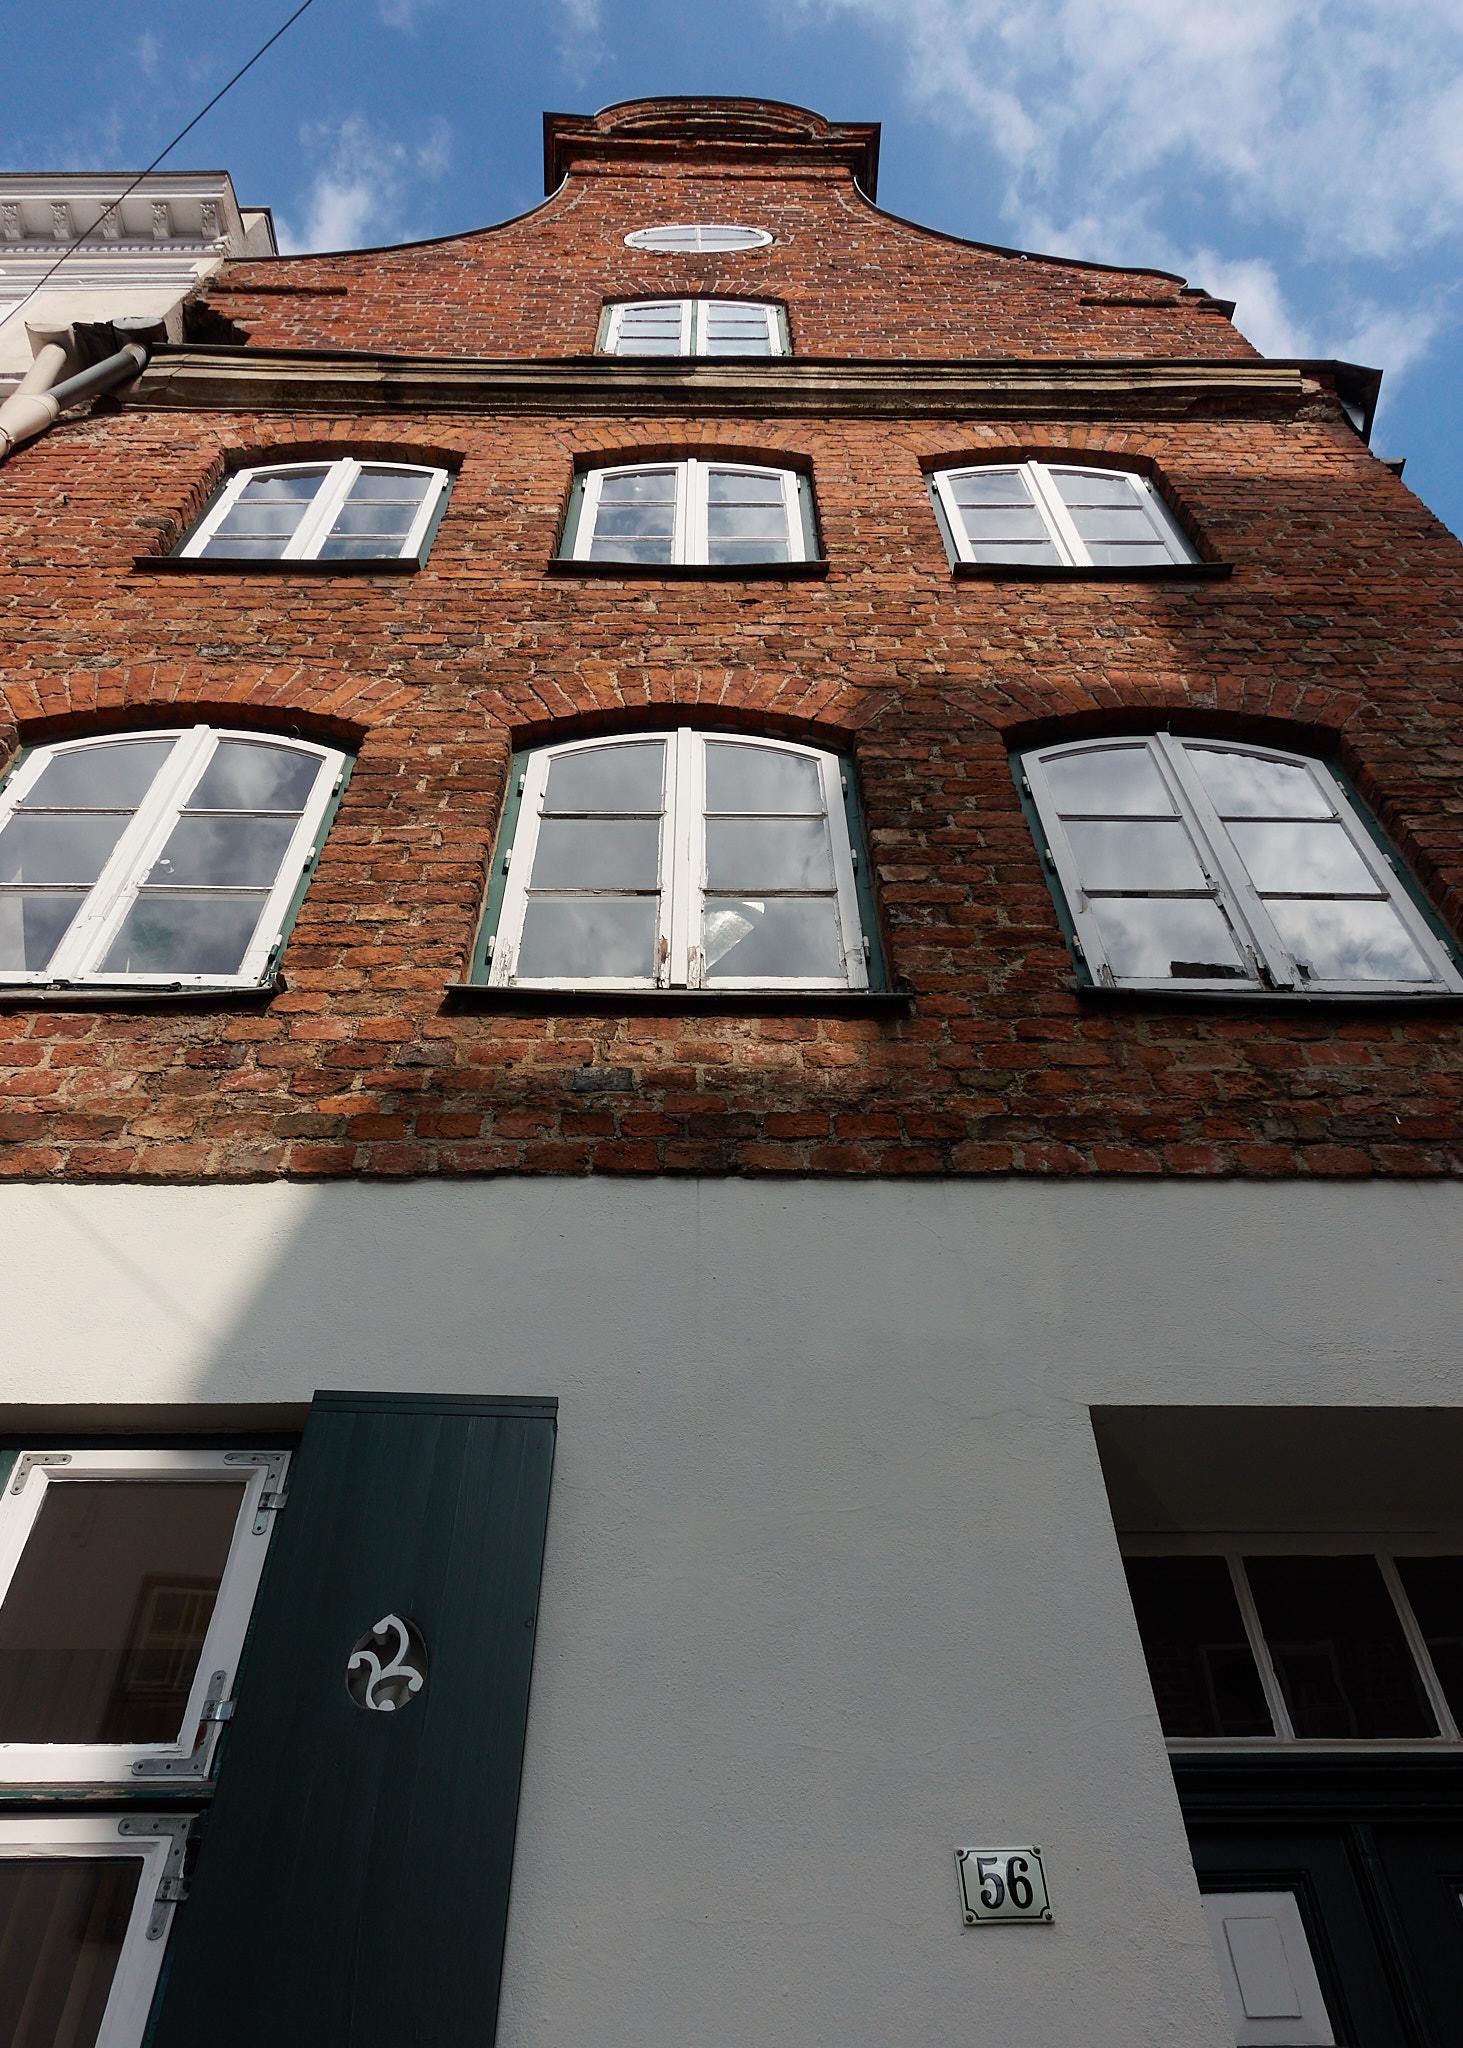 20190330-Lübeck-334.jpg